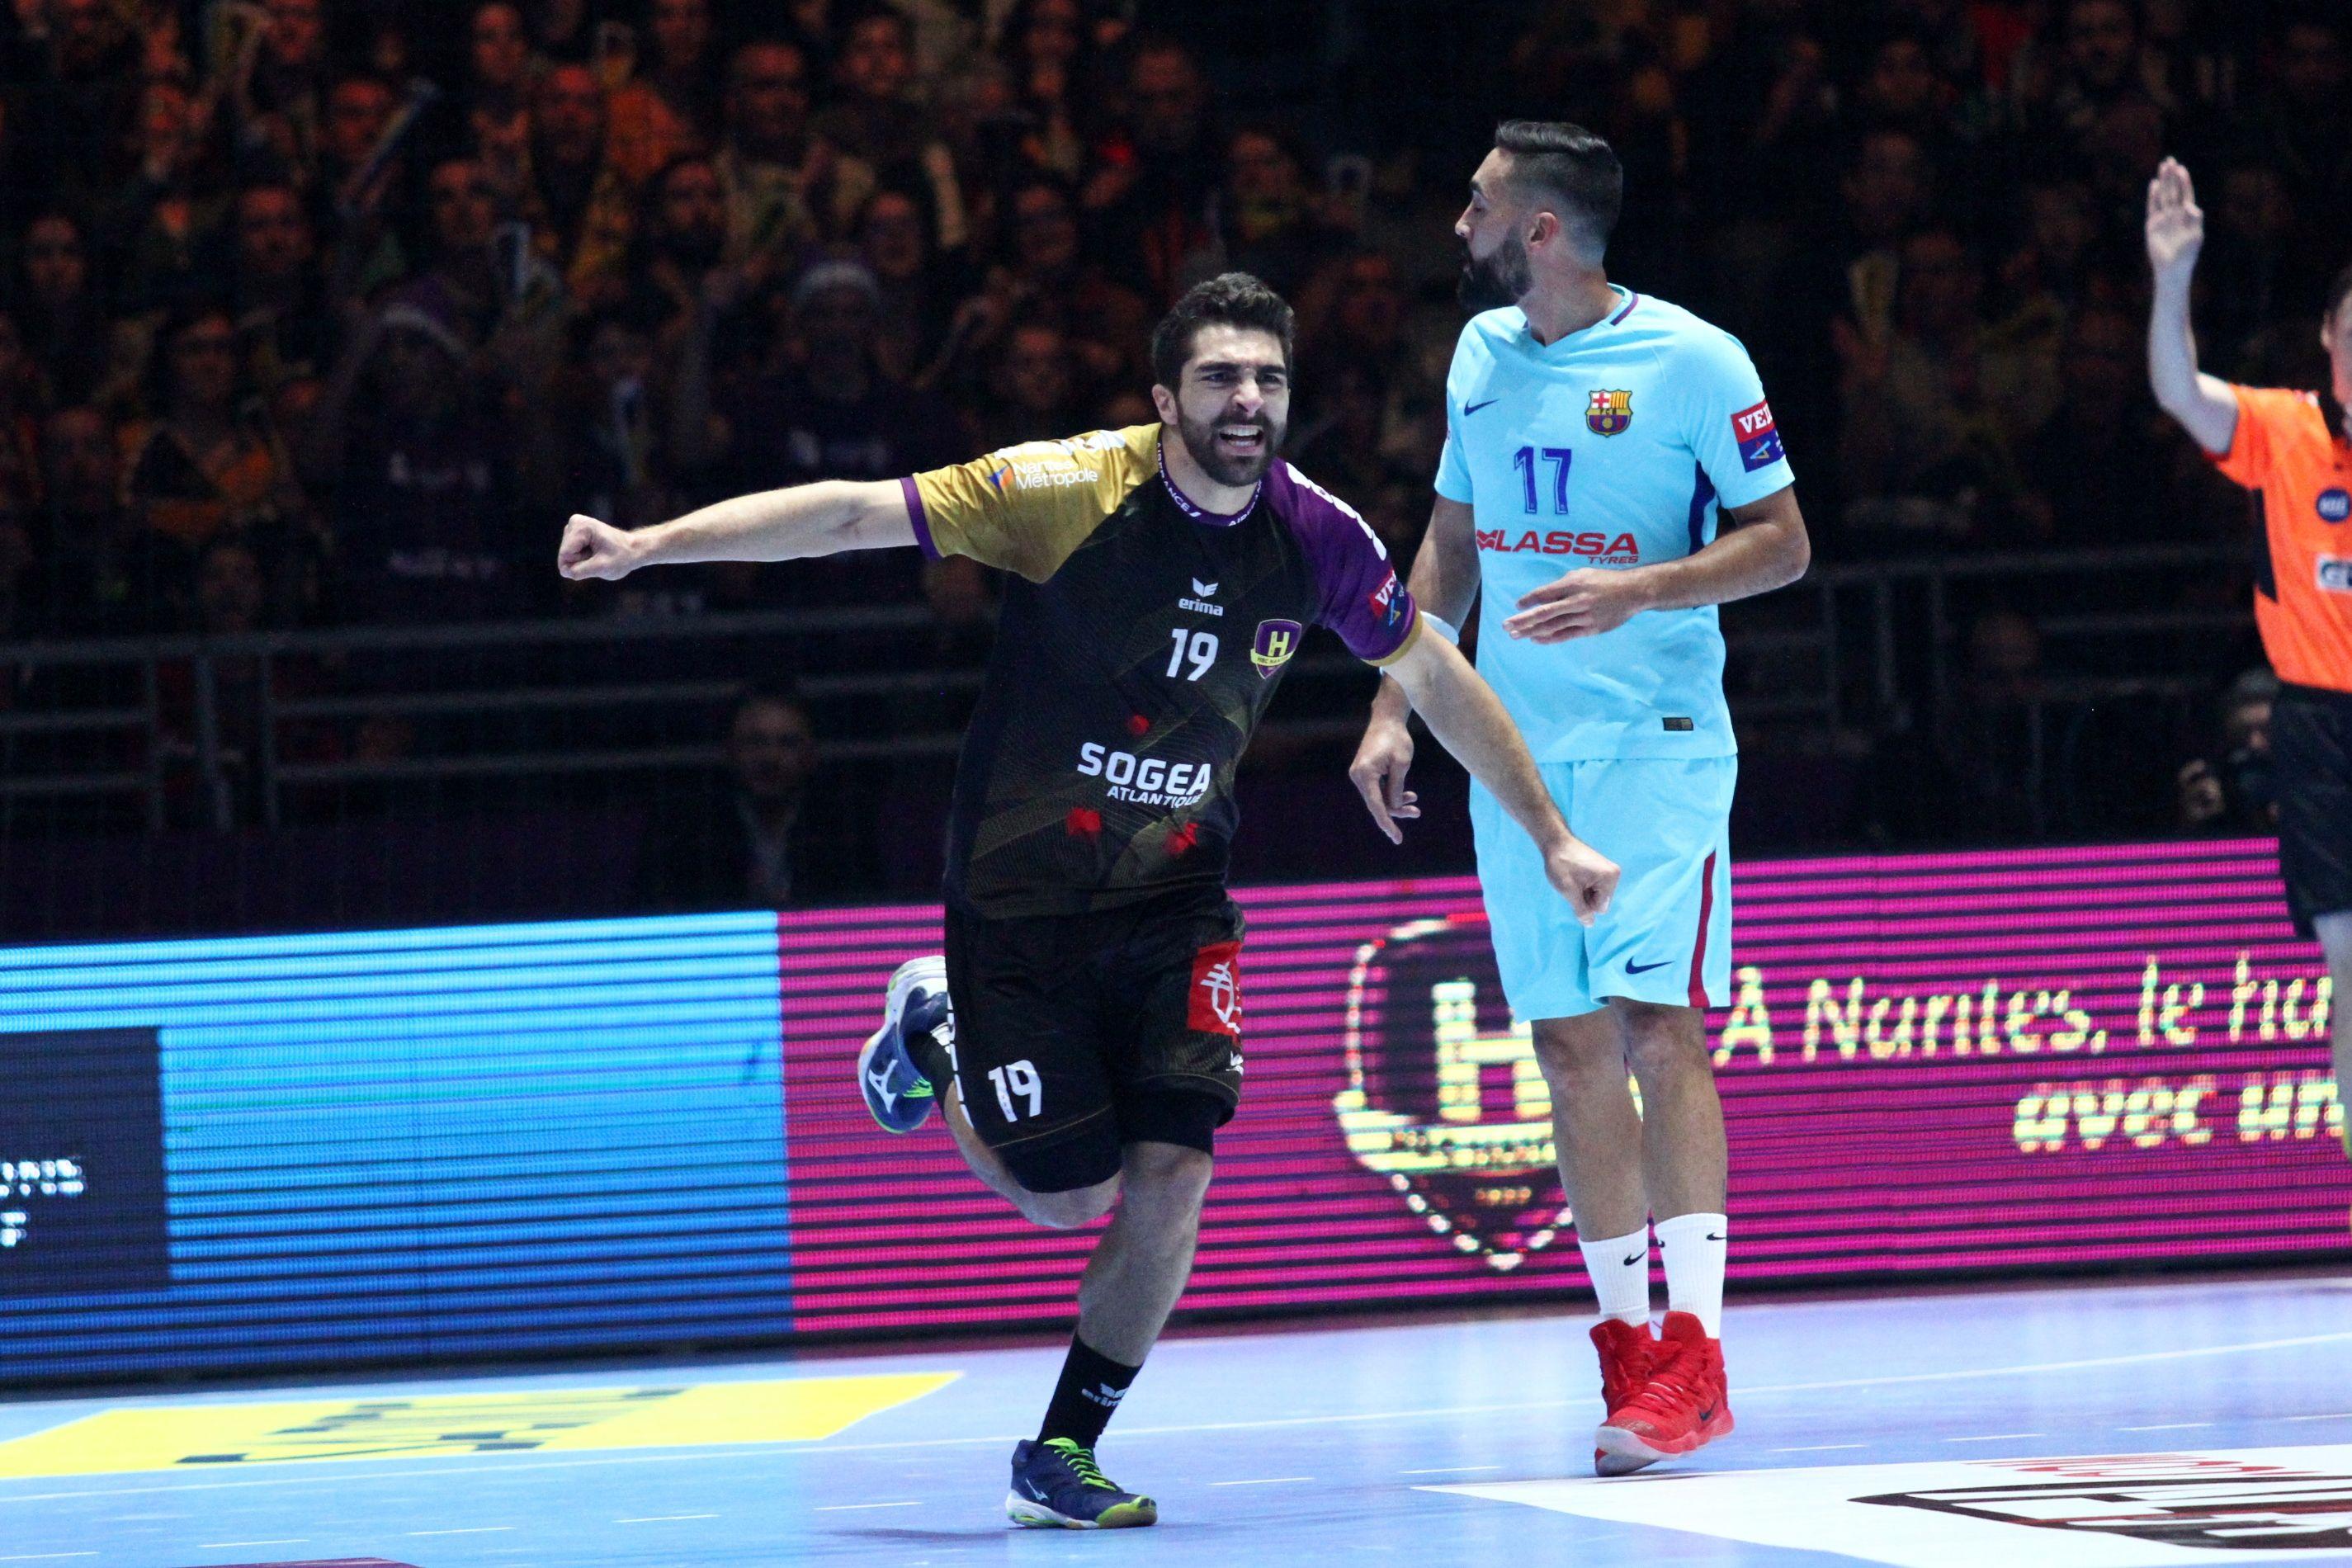 champions league handball